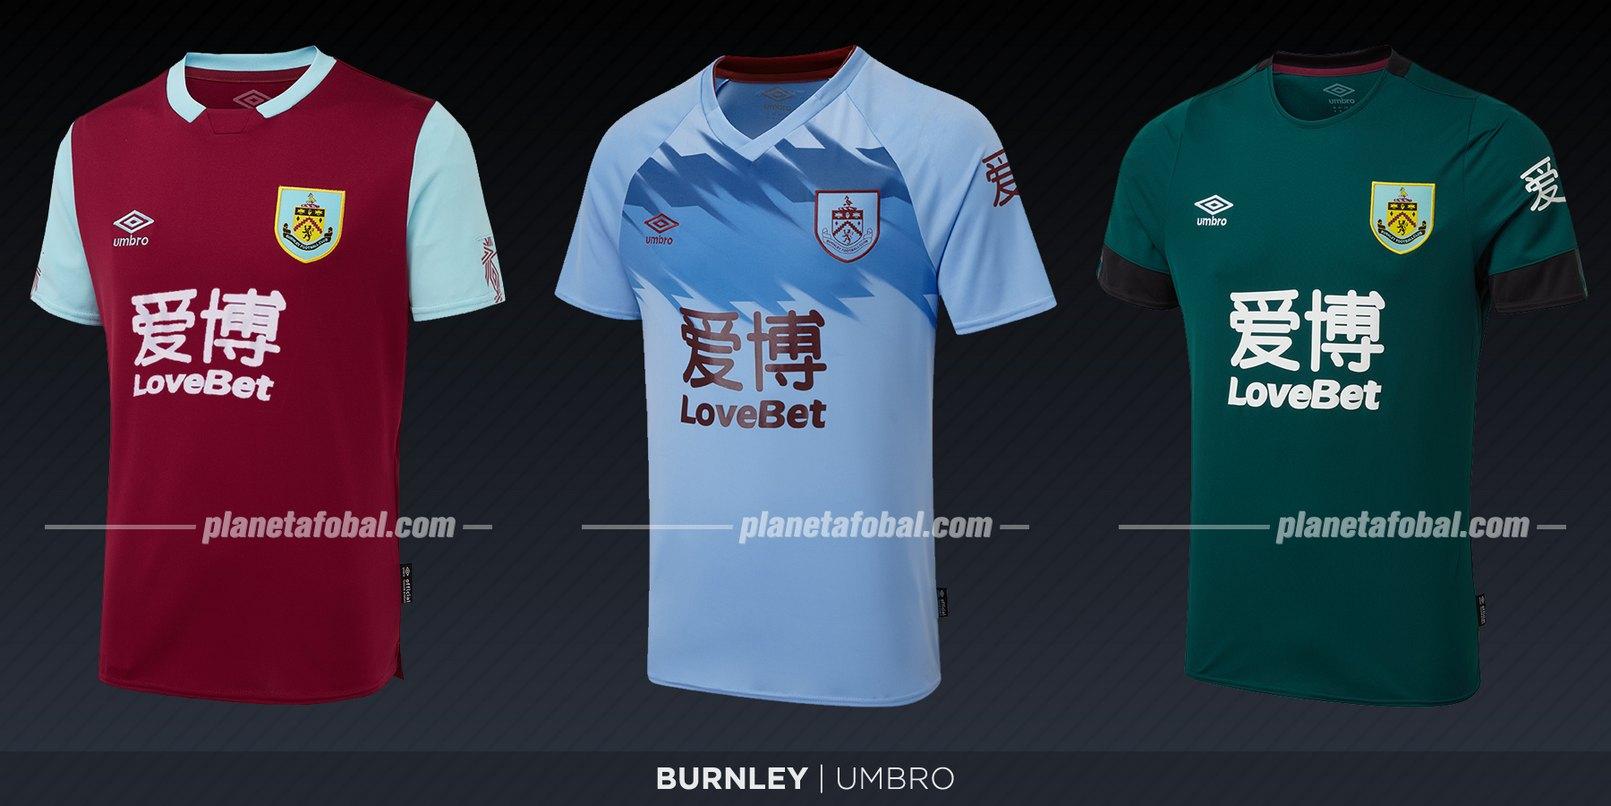 Burnley (Umbro) | Camisetas de la Premier League 2019-2020